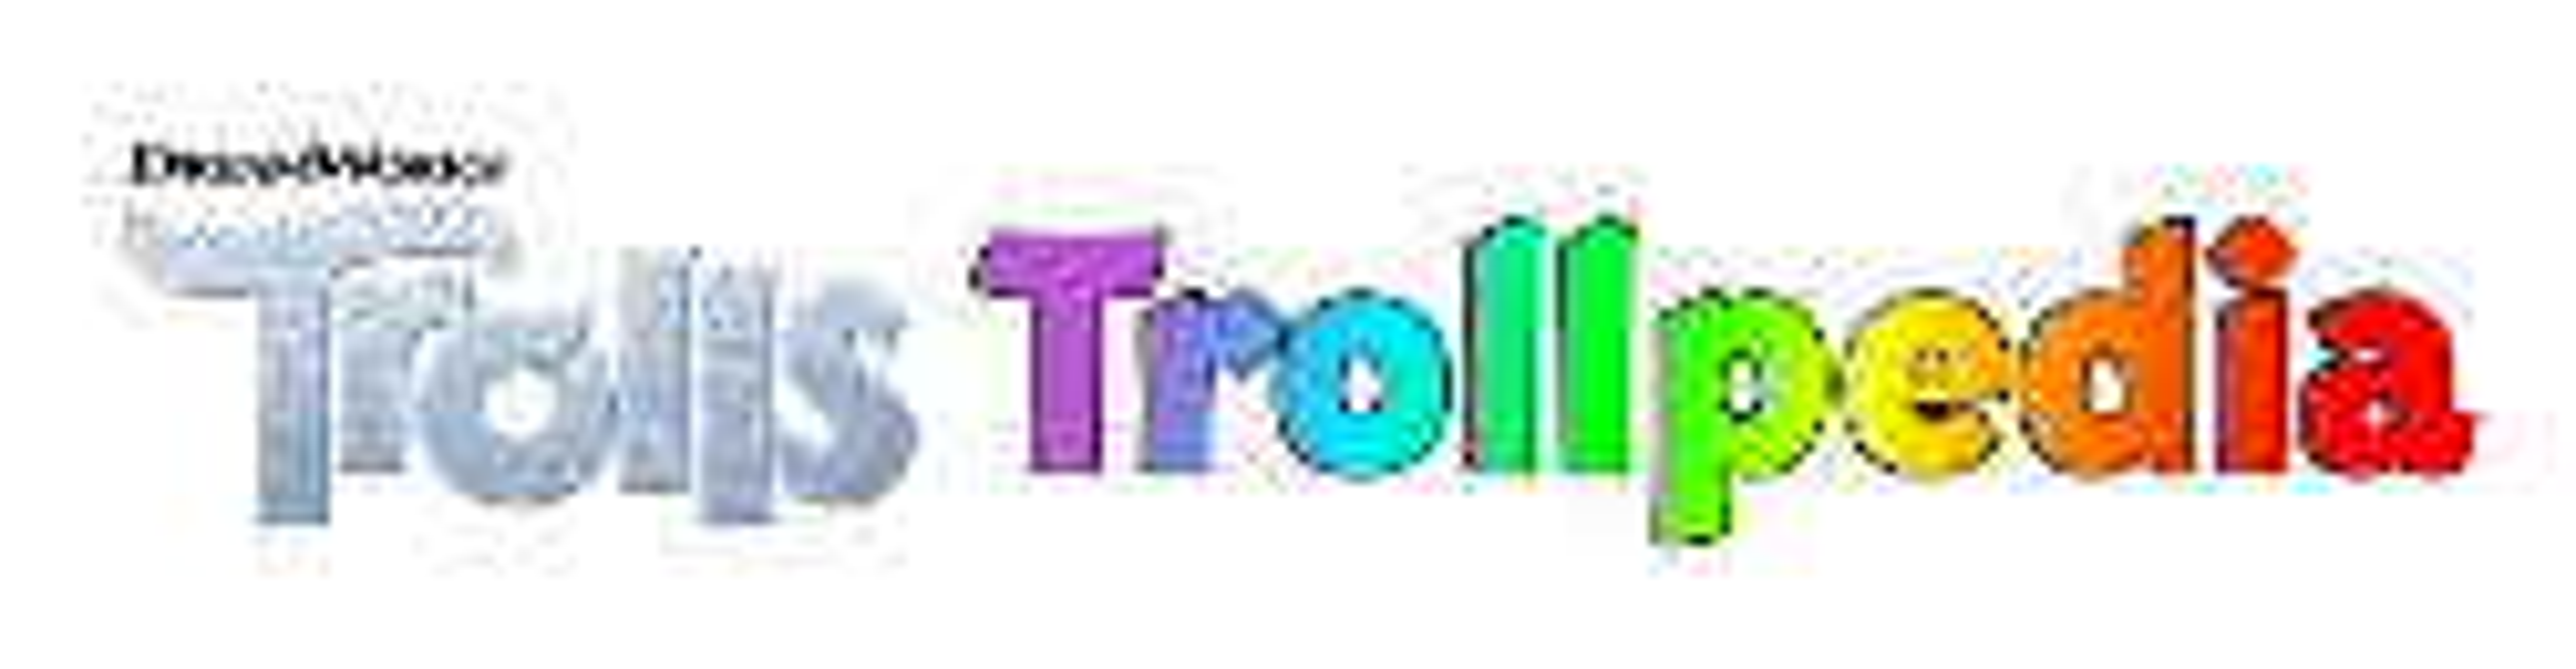 Trolls World Tour premieres on April 17, 2020!